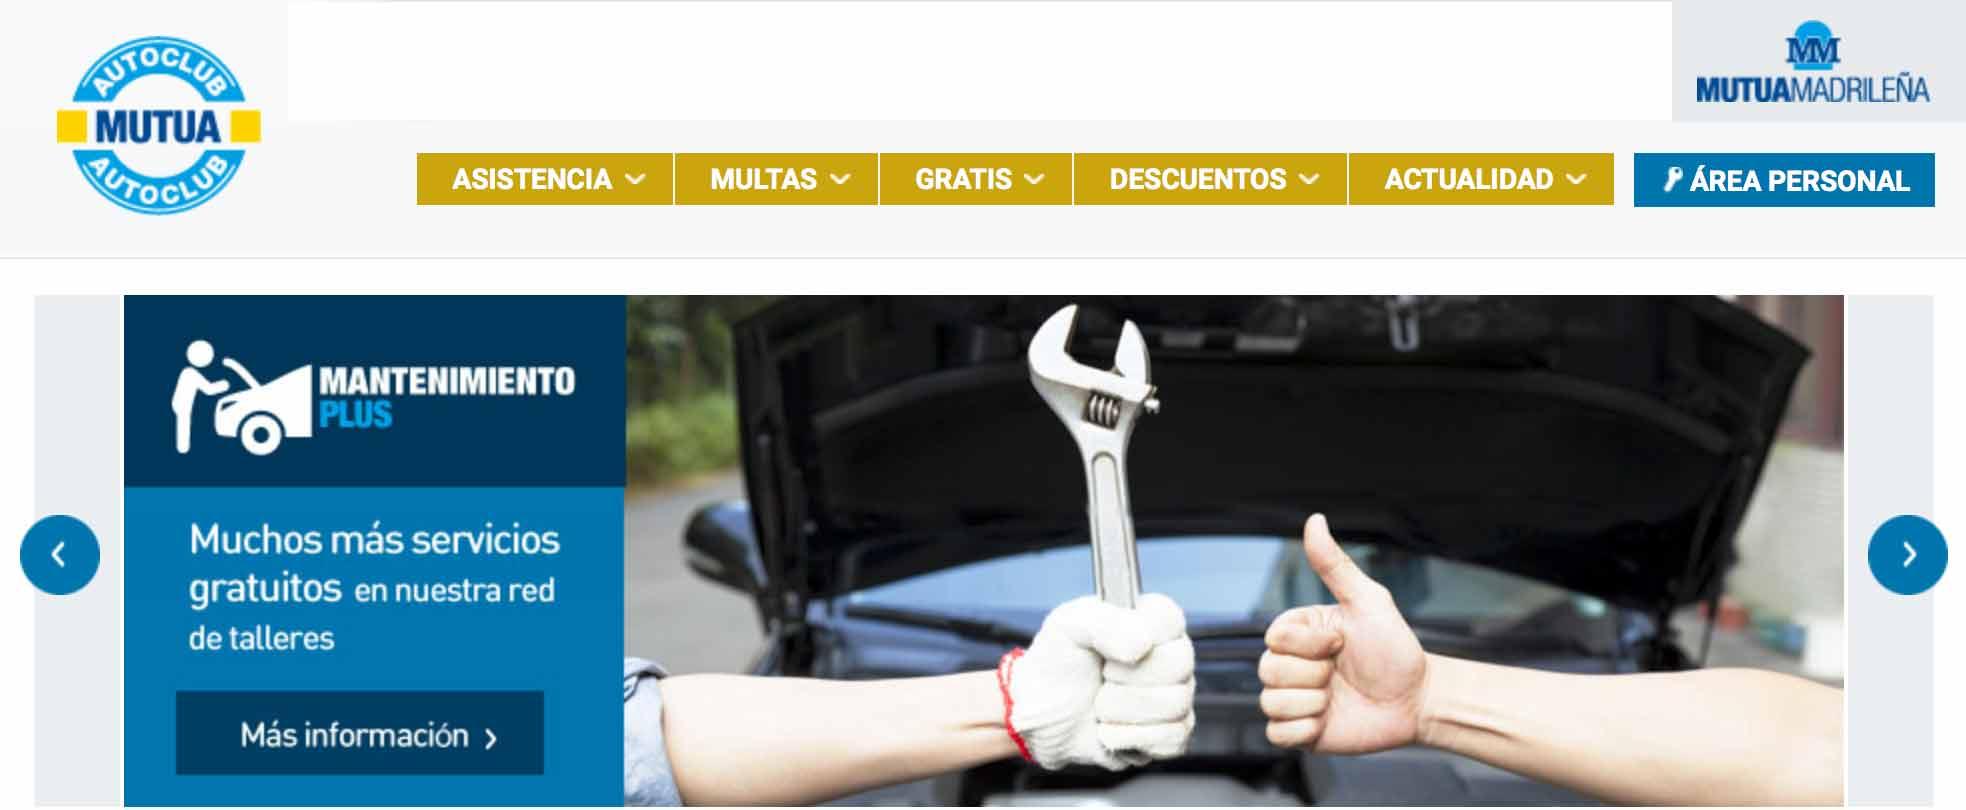 Portada web Mutua Madrileña